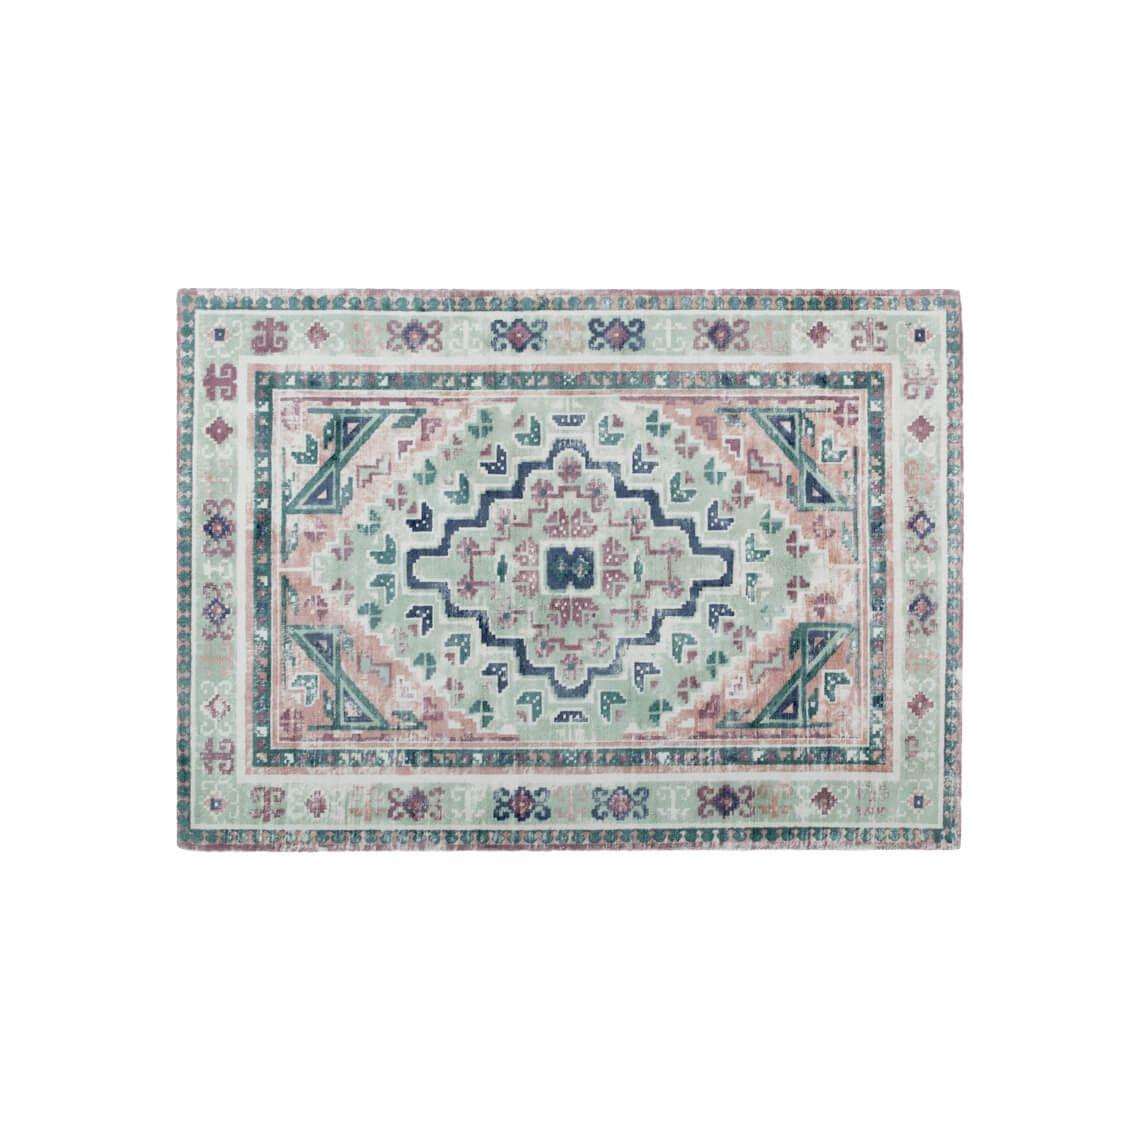 Jahaira Floor Rug Size W 160cm x D 230cm x H 1cm Freedom